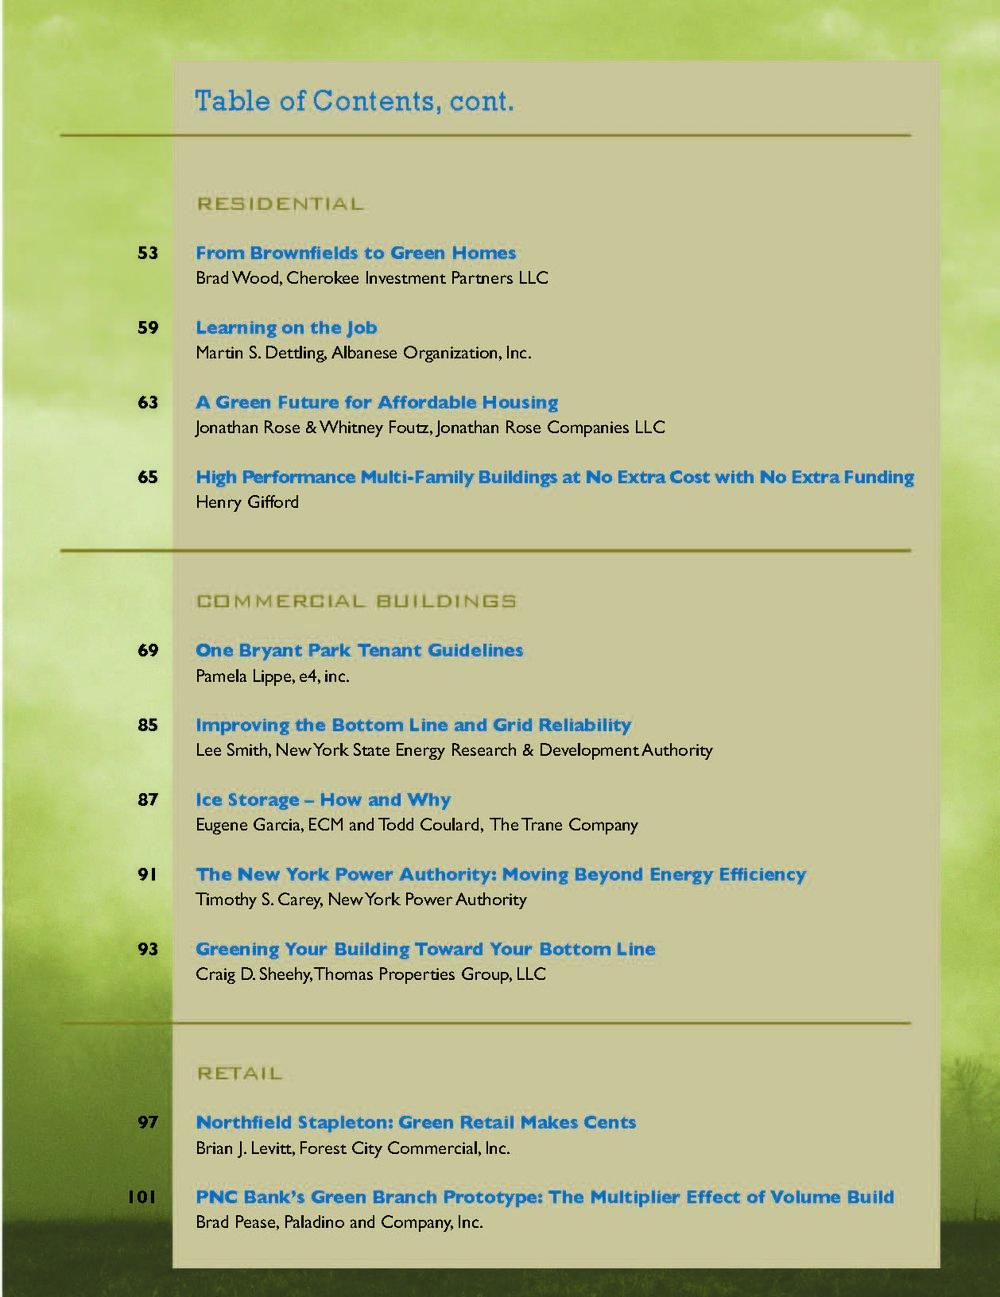 EDLL_Book 4 toc 2.jpg